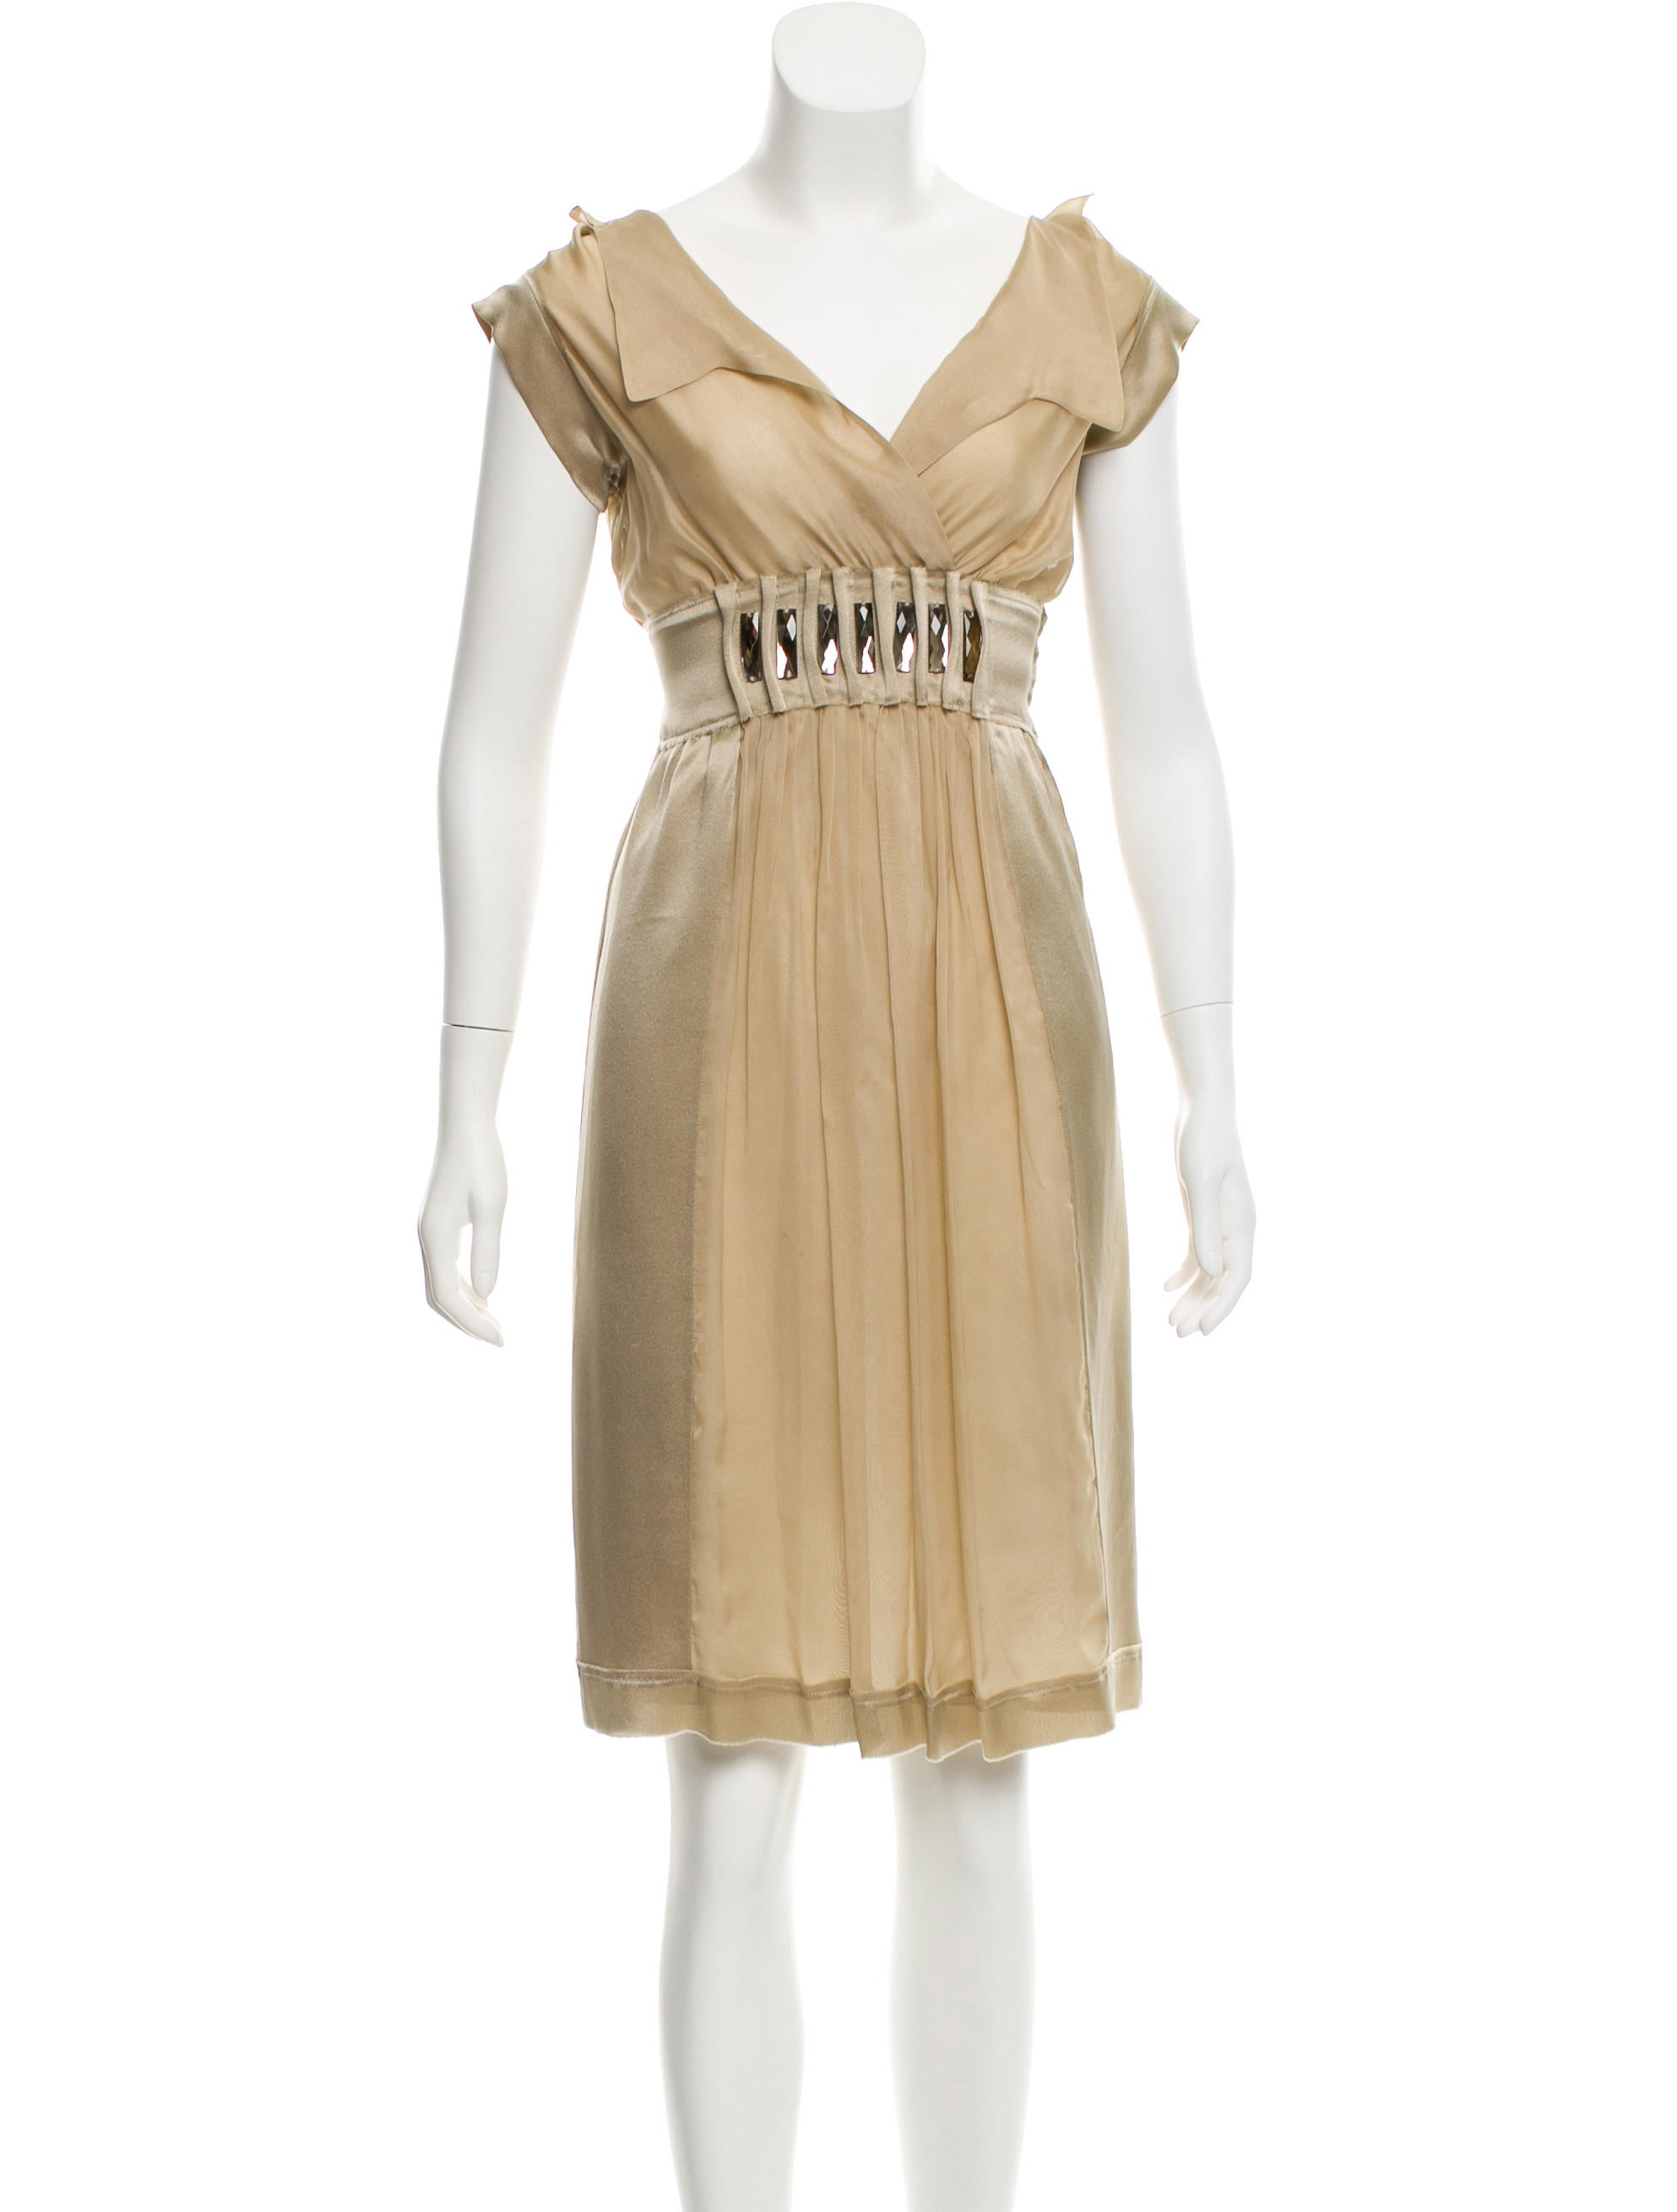 f3c85abcba Alberta Ferretti Silk Embellished Dress - Clothing - ALB26542 | The ...